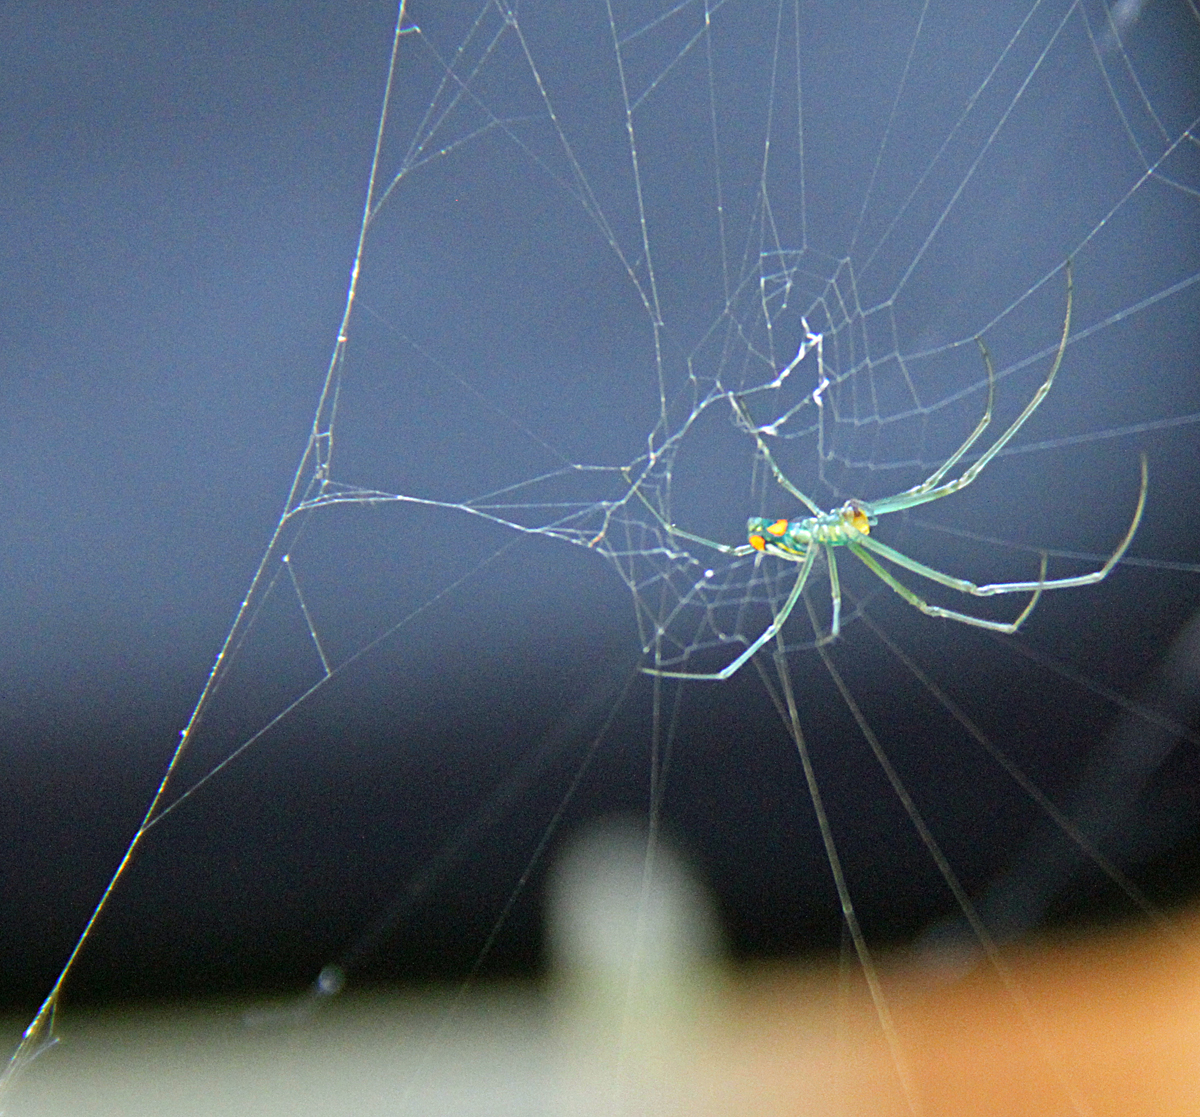 7407---9-13-14  Hannah's Spider